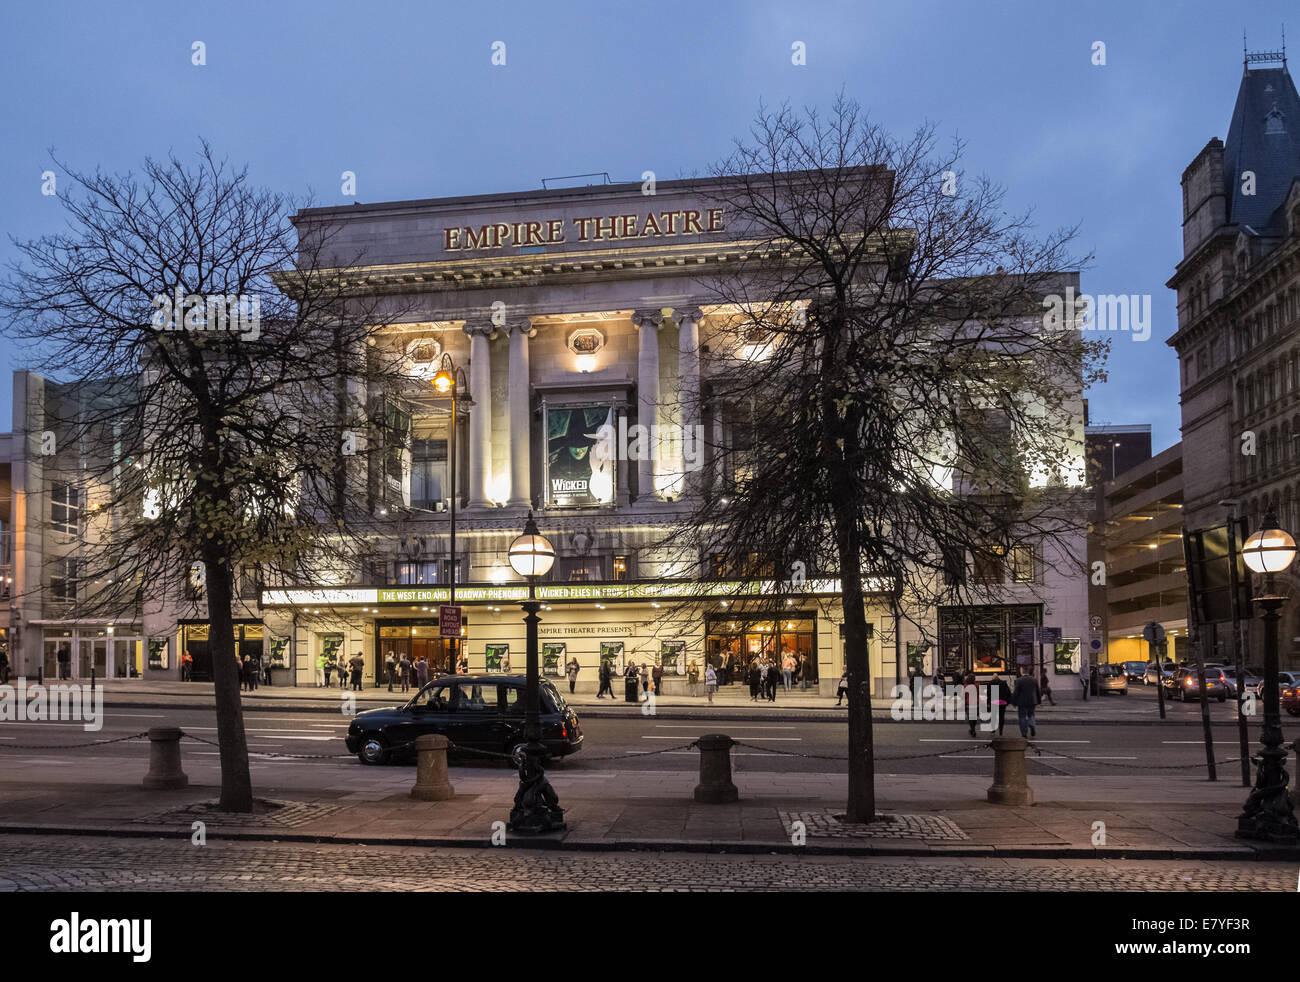 Empire Theatre, Lime Street, Liverpool, England, UK - Stock Image